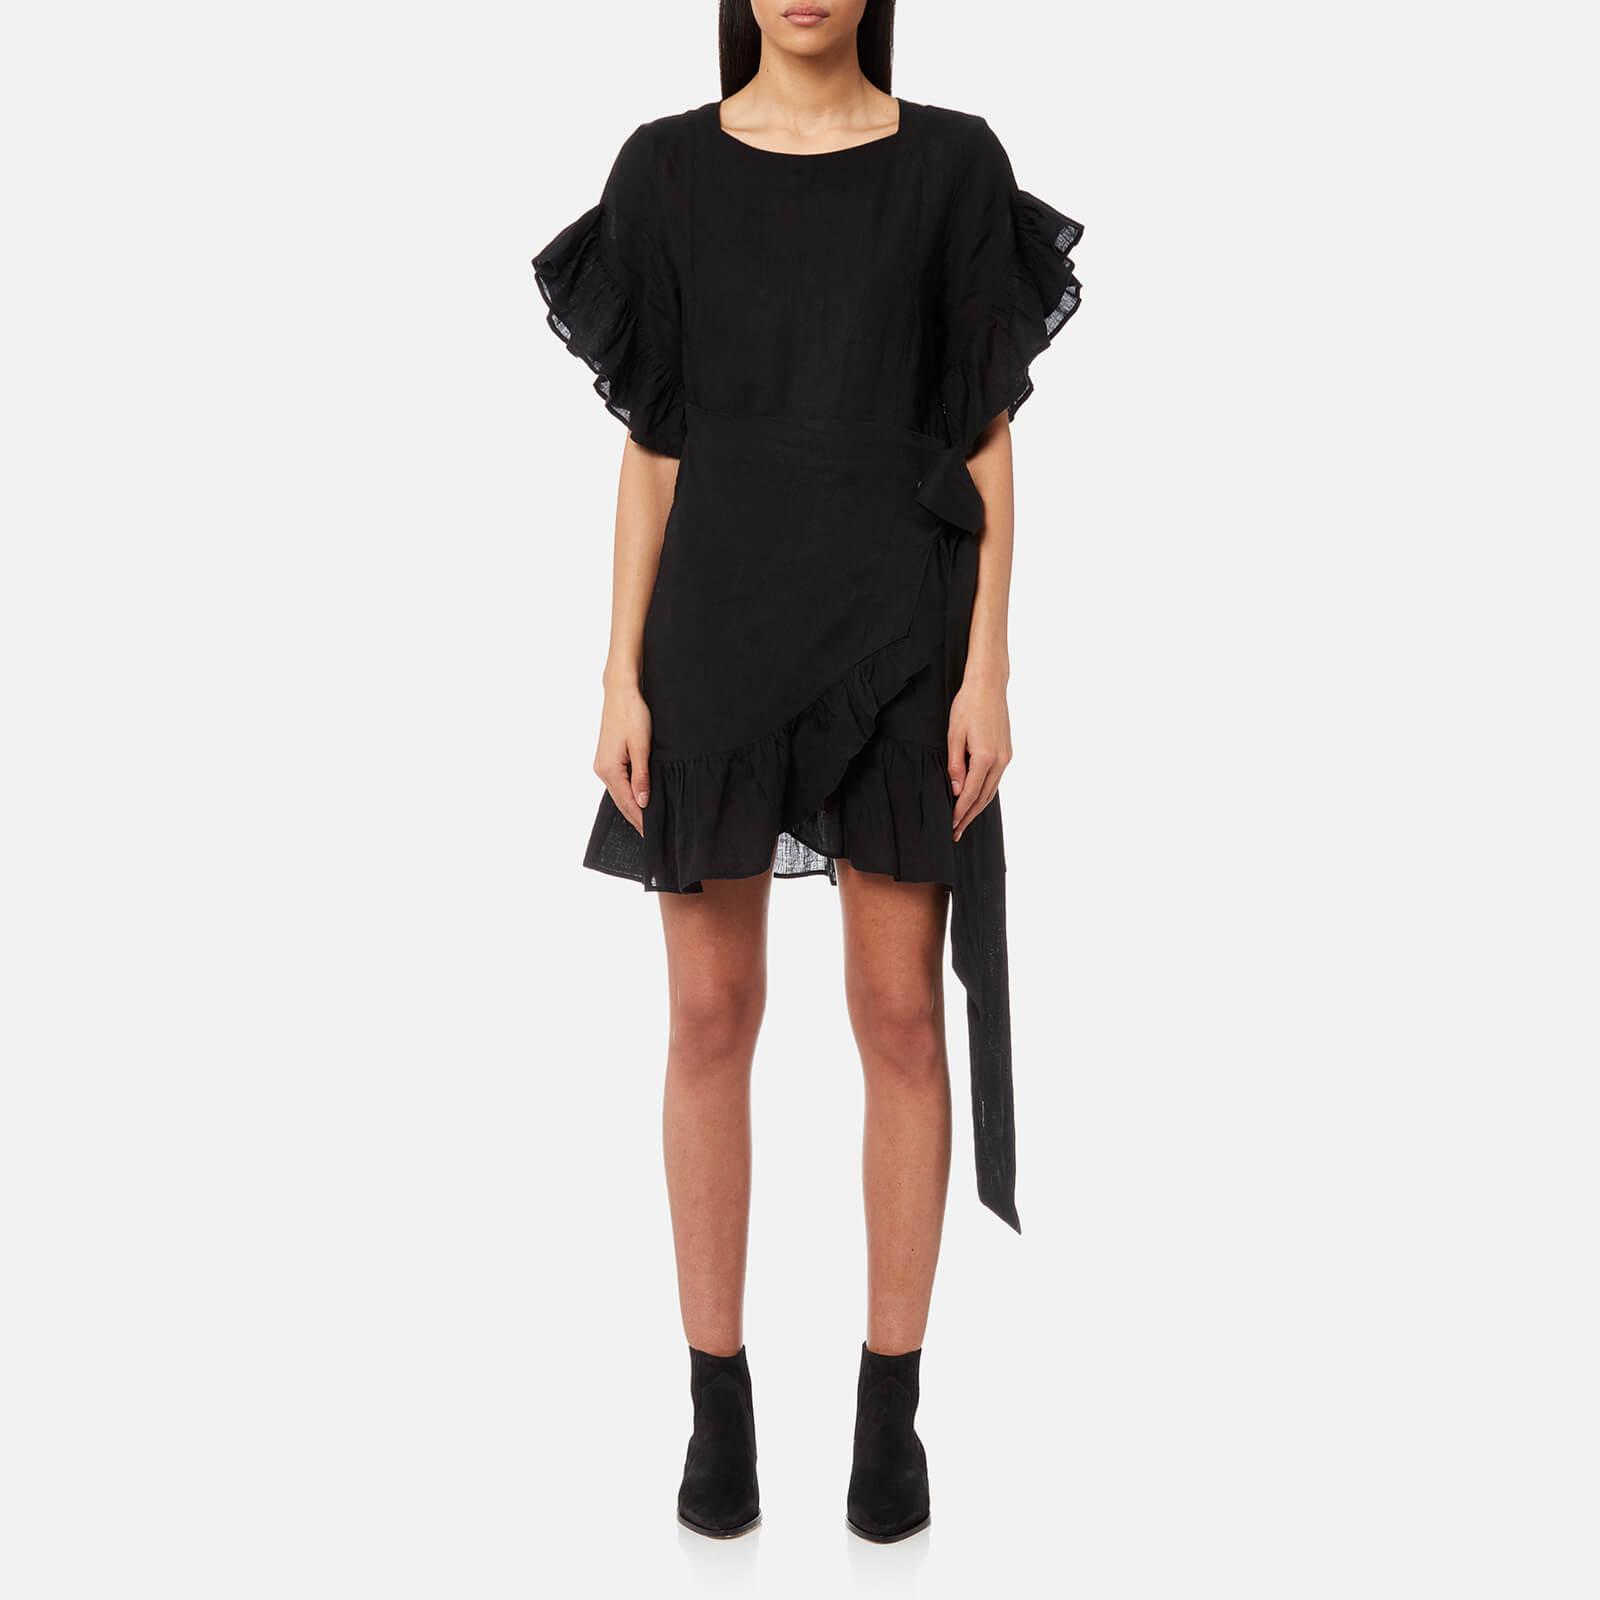 fb2c7b52e6b Isabel Marant Etoile Women s Delicia Chic Linen Dress - Black - Free UK  Delivery over £50